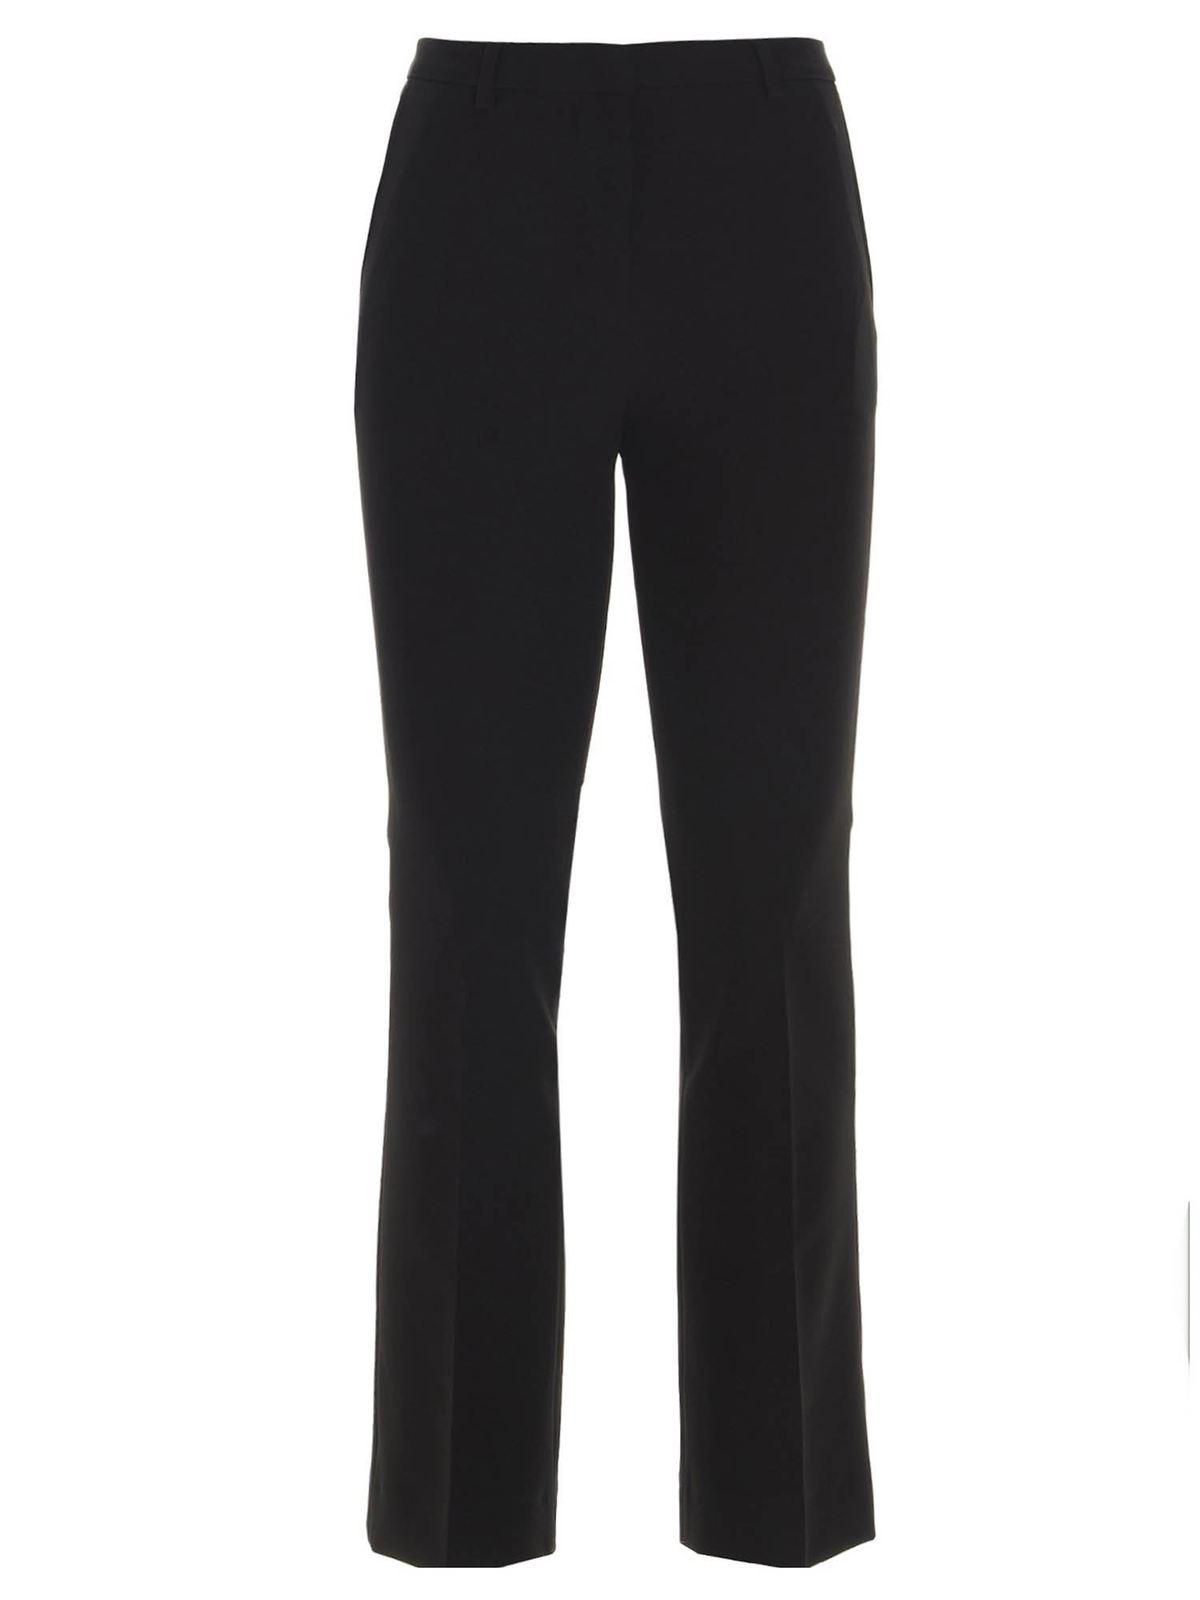 Pt Torino Wools JAINE PANTS IN BLACK